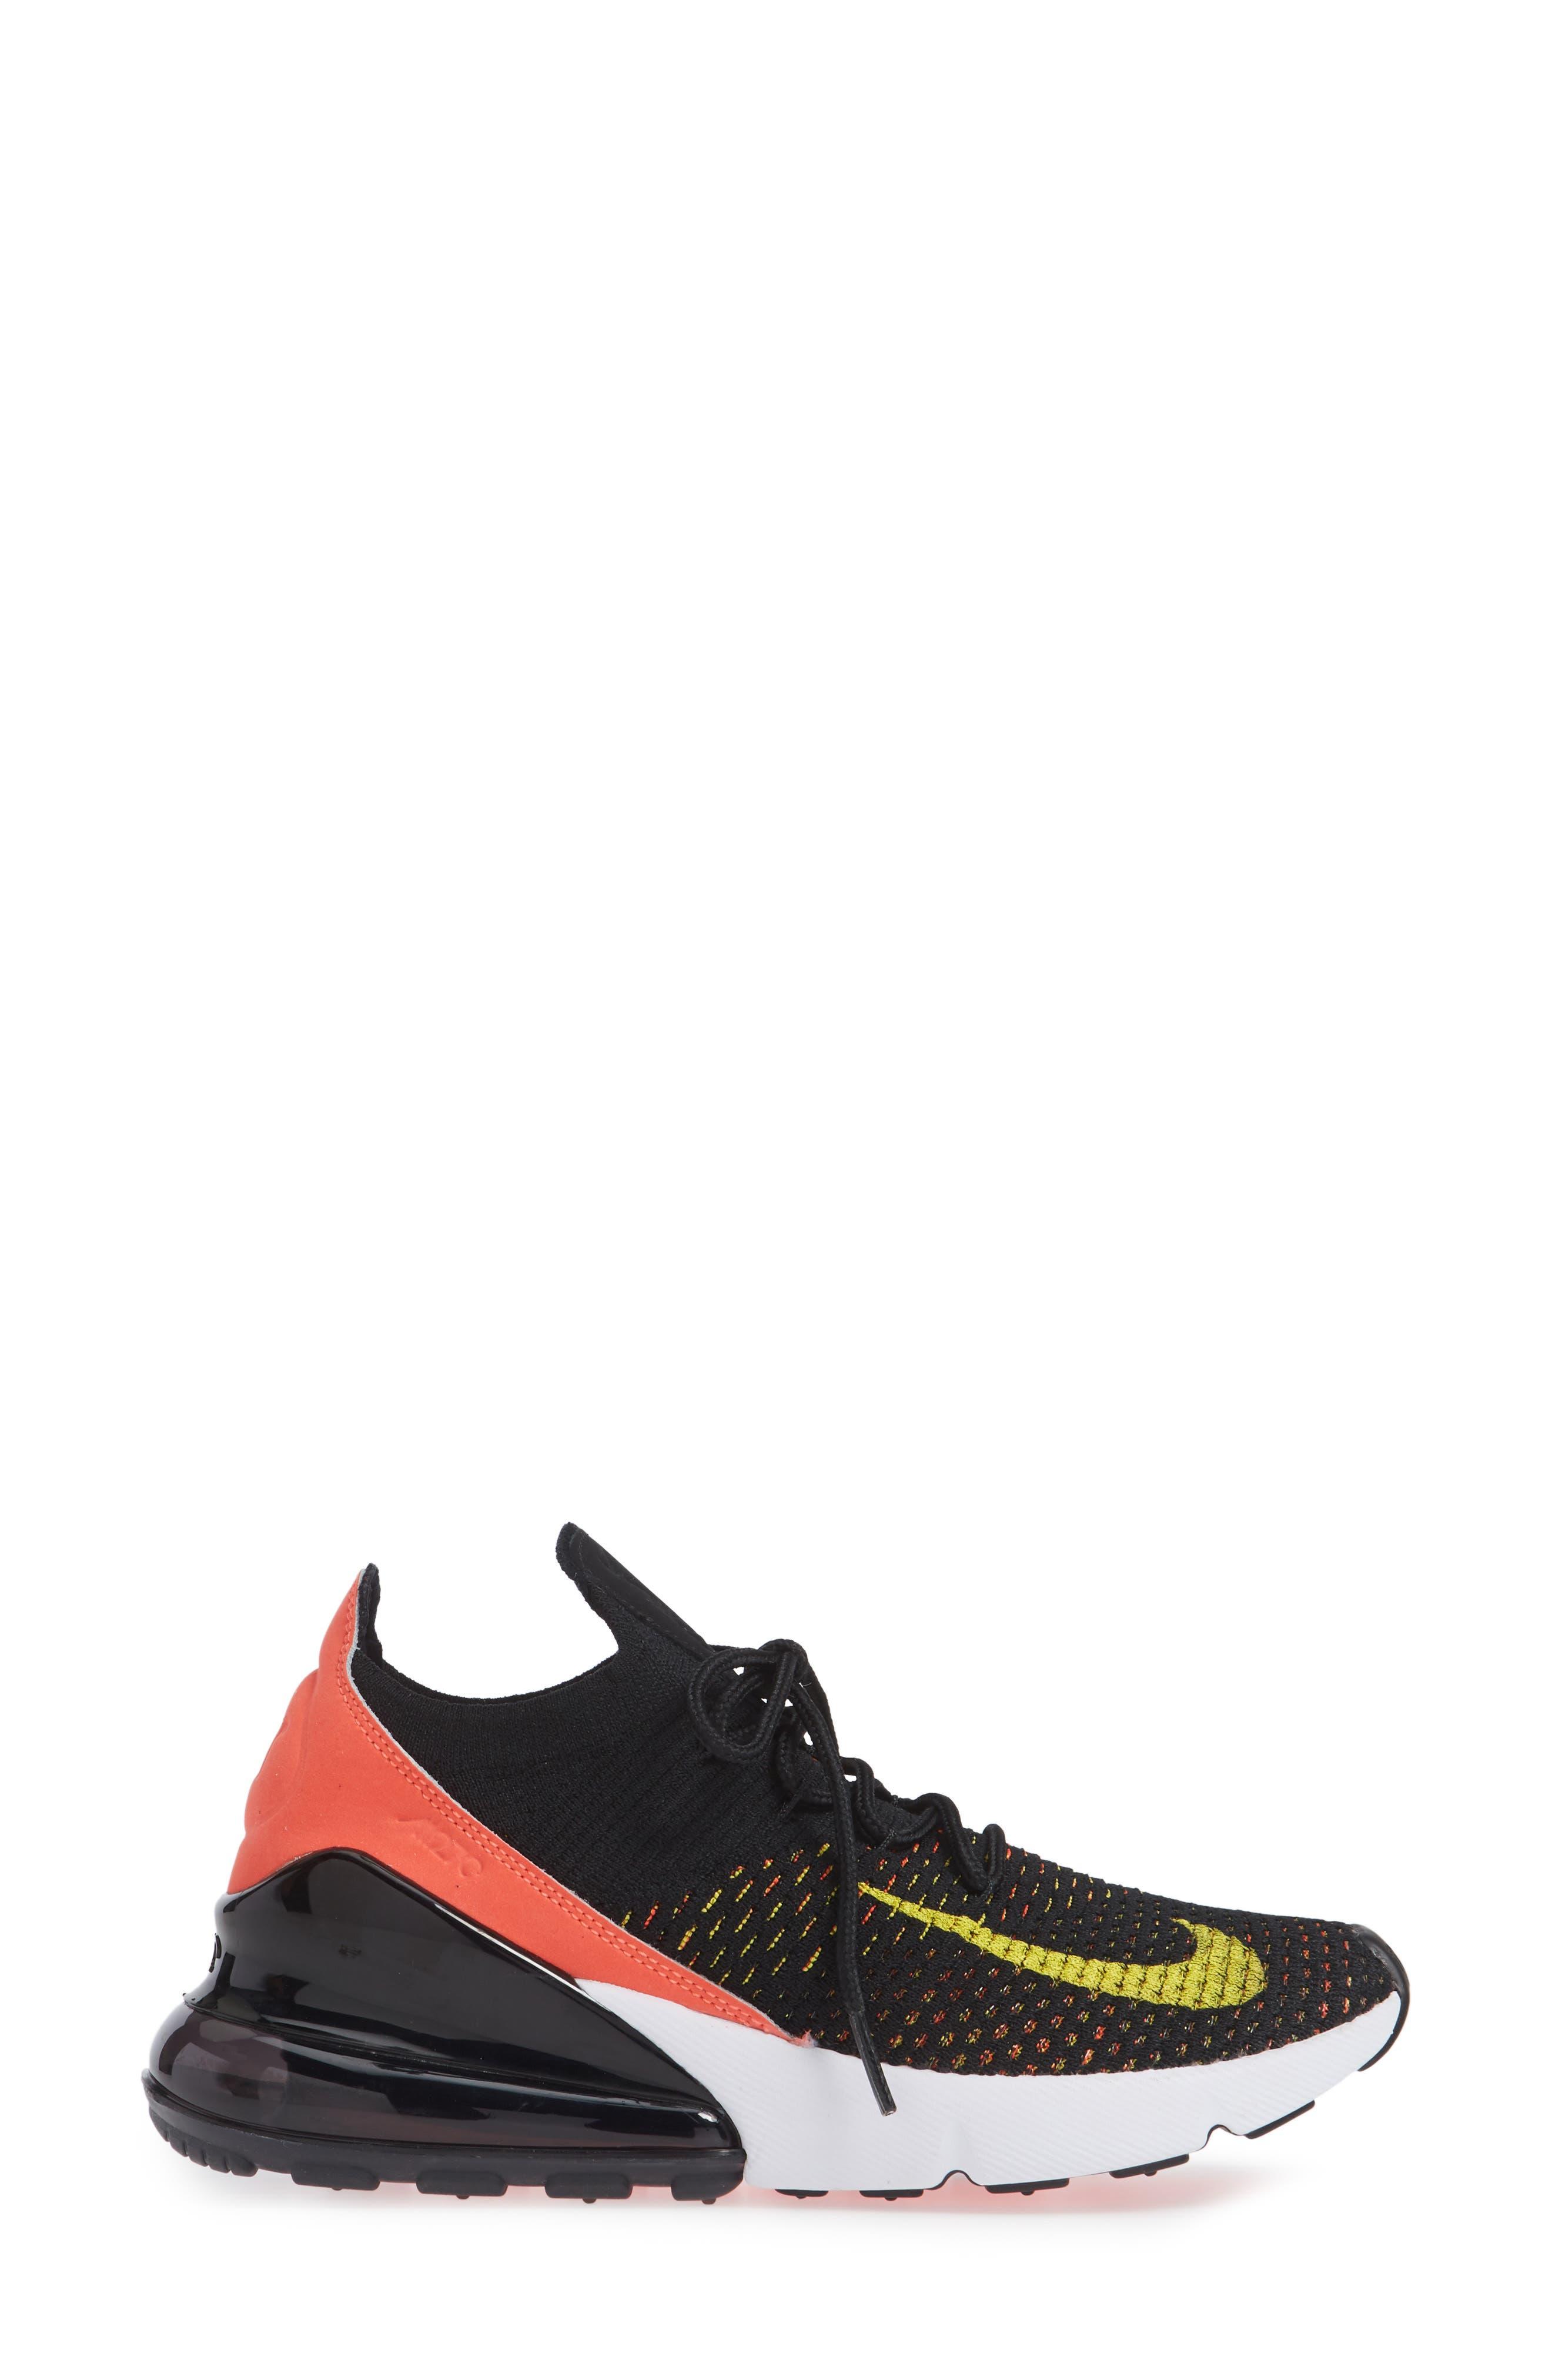 Air Max 270 Flyknit Sneaker,                             Alternate thumbnail 3, color,                             BLACK/ YELLOW STRIKE/ CRIMSON